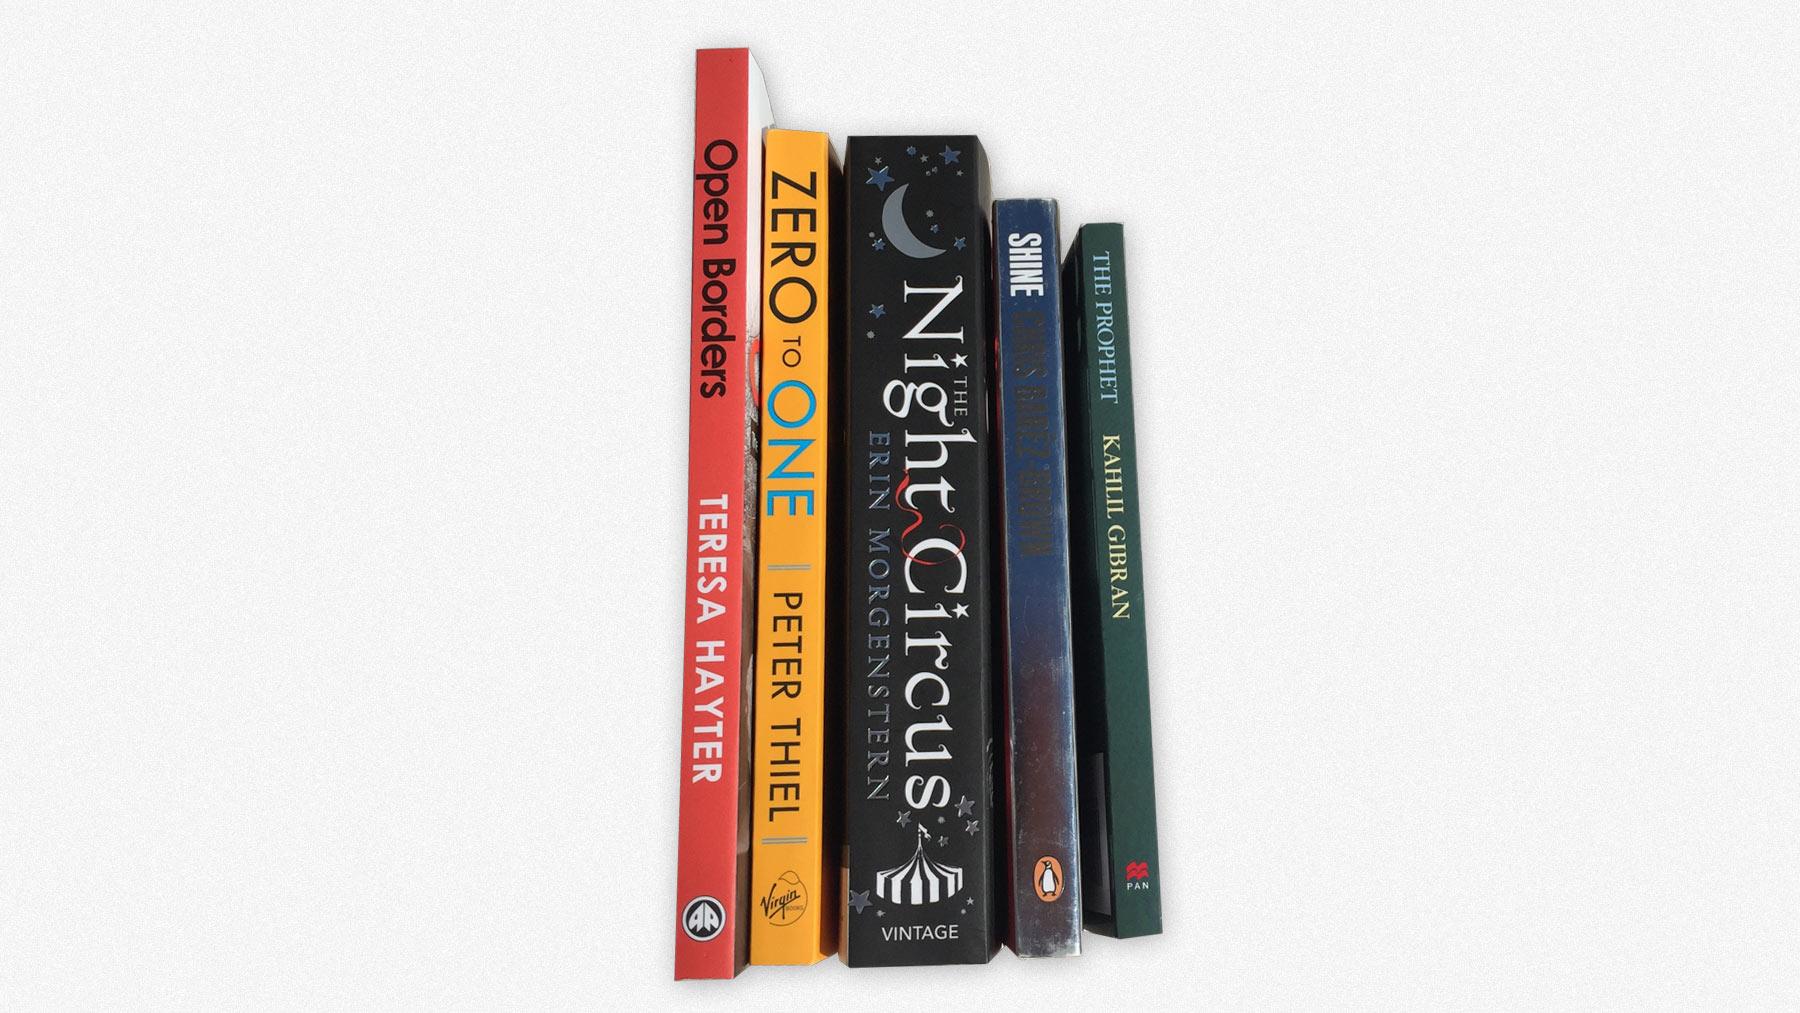 The Lush Library: The Reading List - Lush Fresh Handmade Cosmetics UK